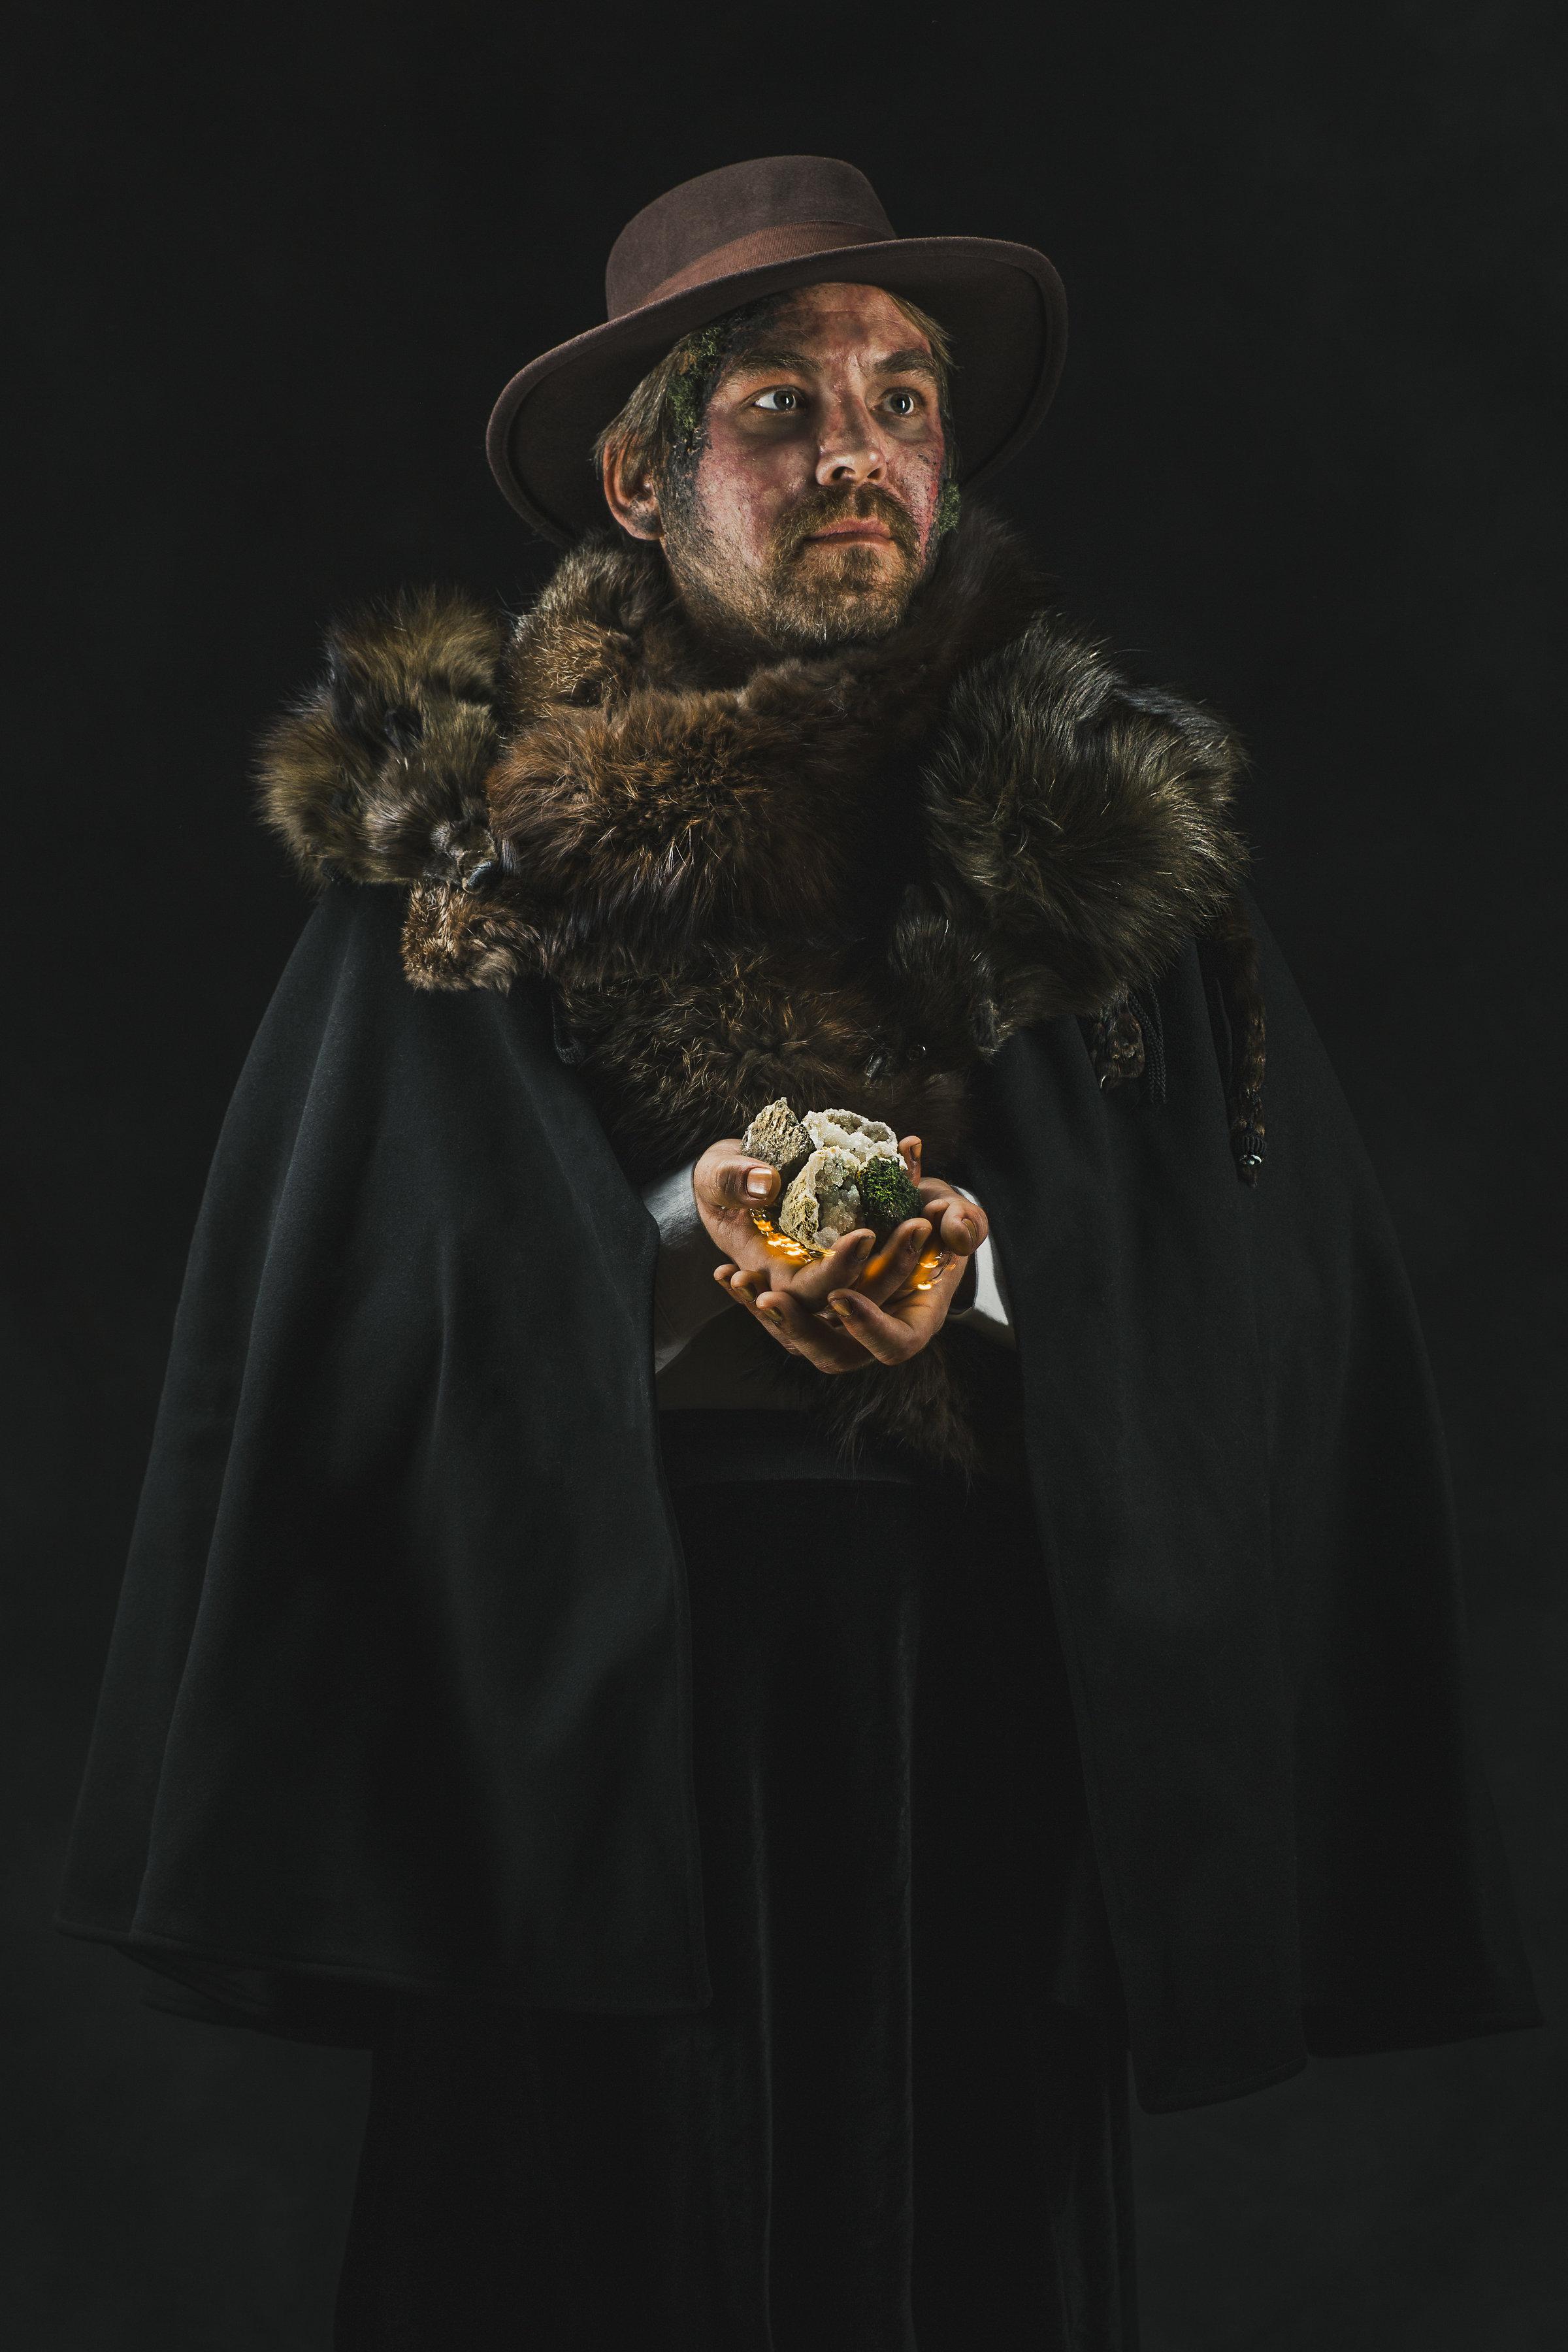 Hermit of the Wissahickon